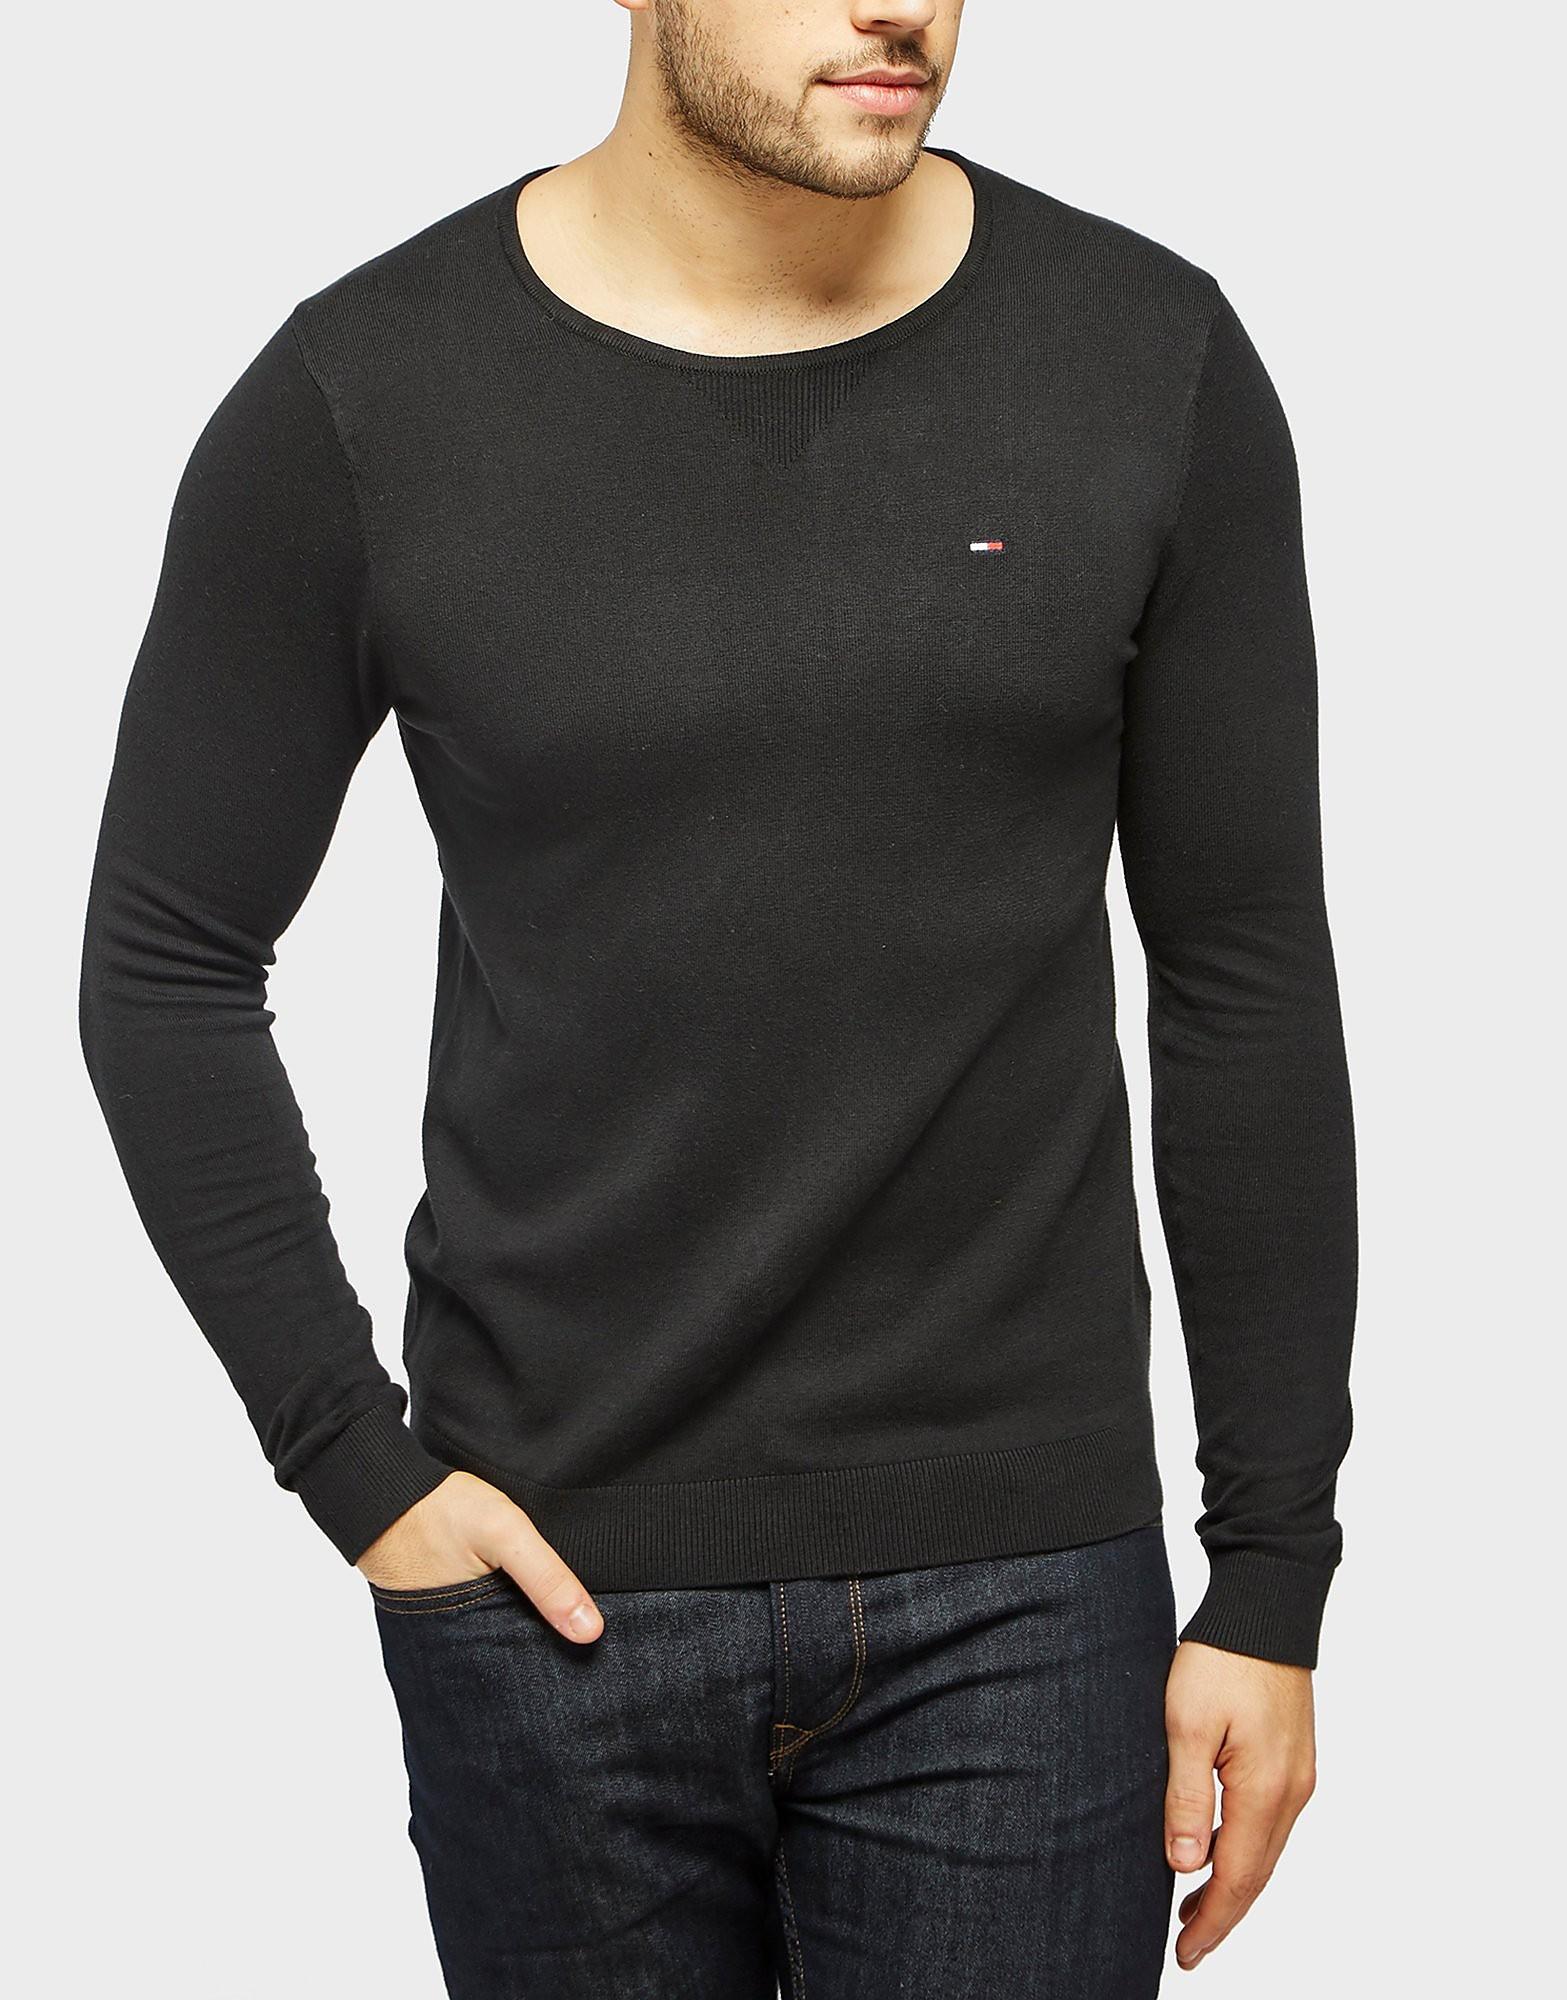 Tommy Hilfiger Long Sleeve Crew T-Shirt